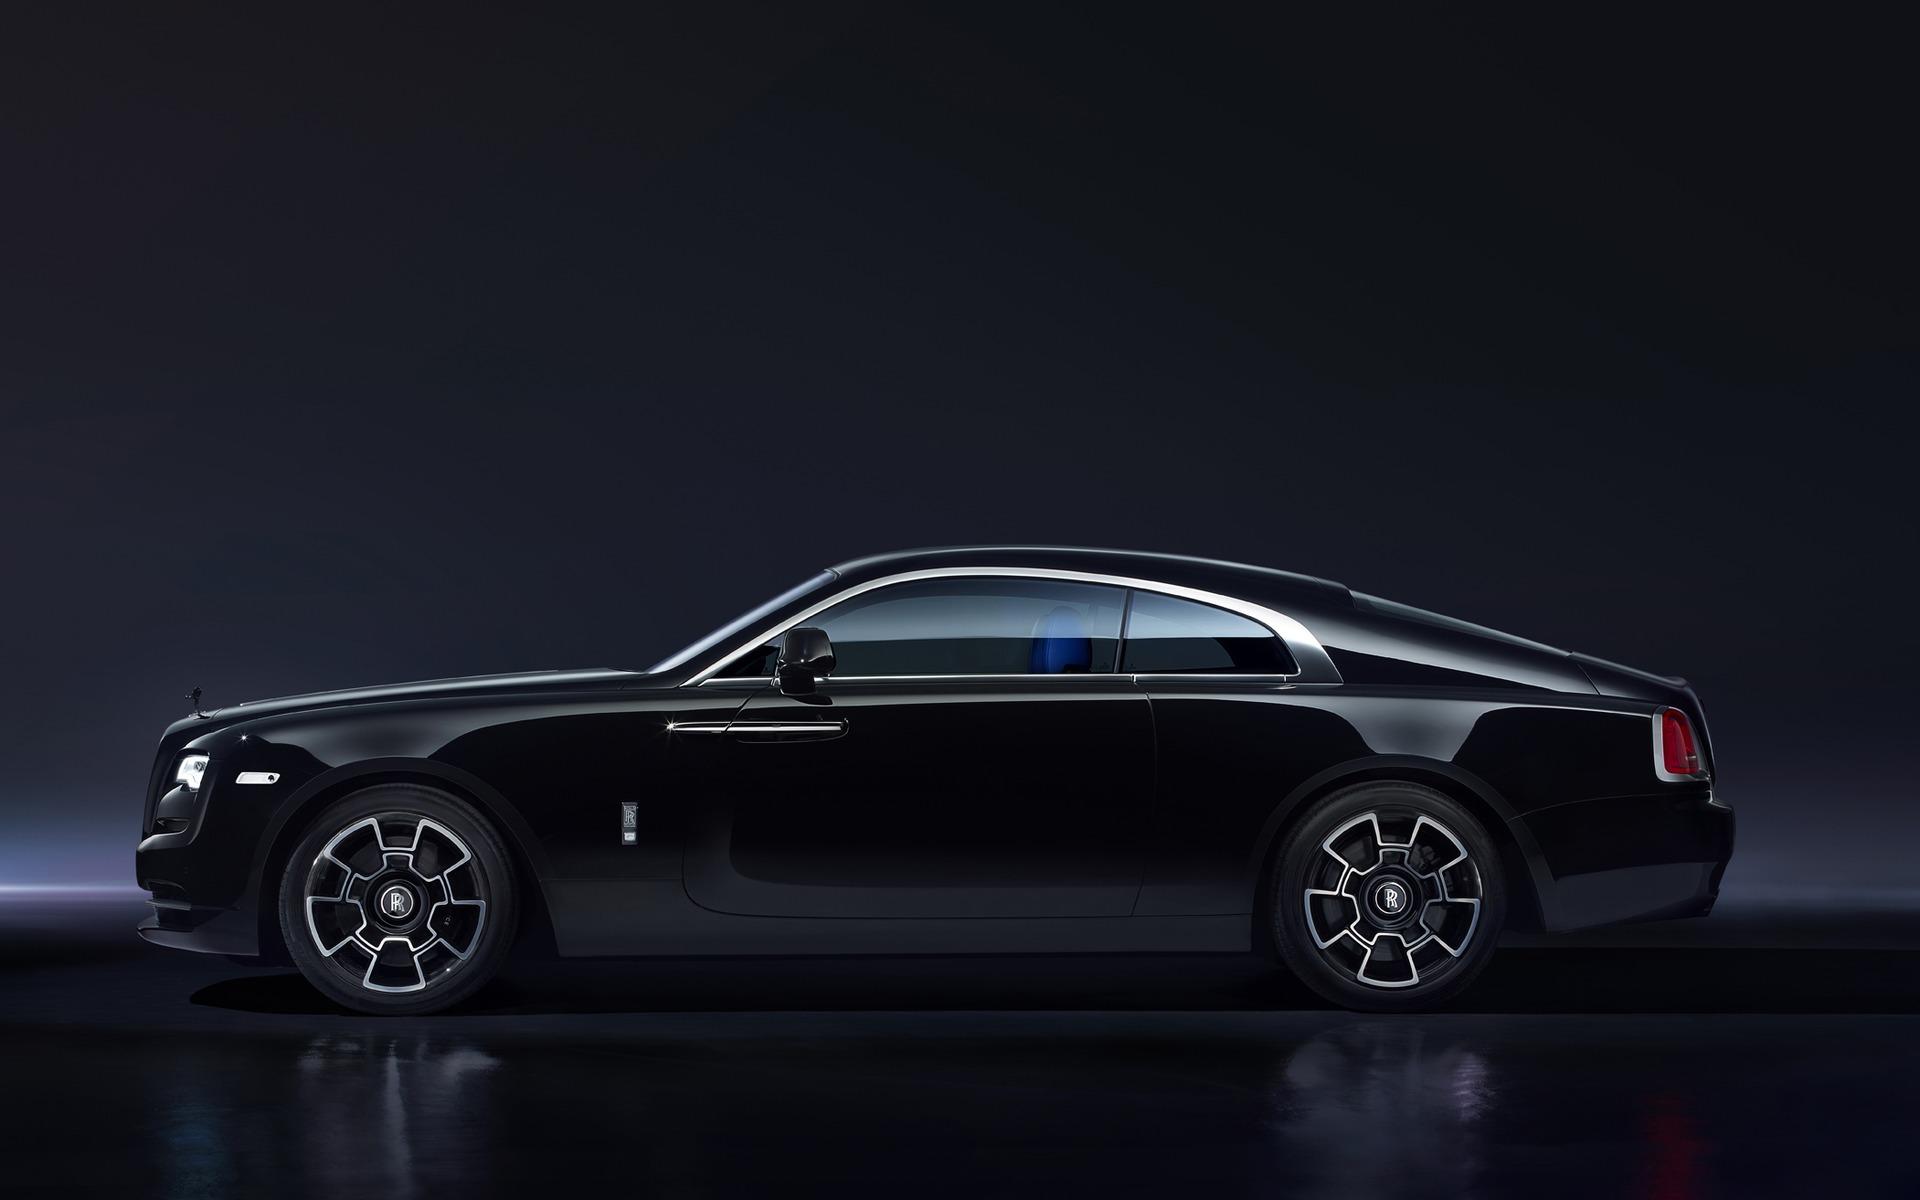 <p>2017 Rolls-Royce Wraith Black Badge</p>